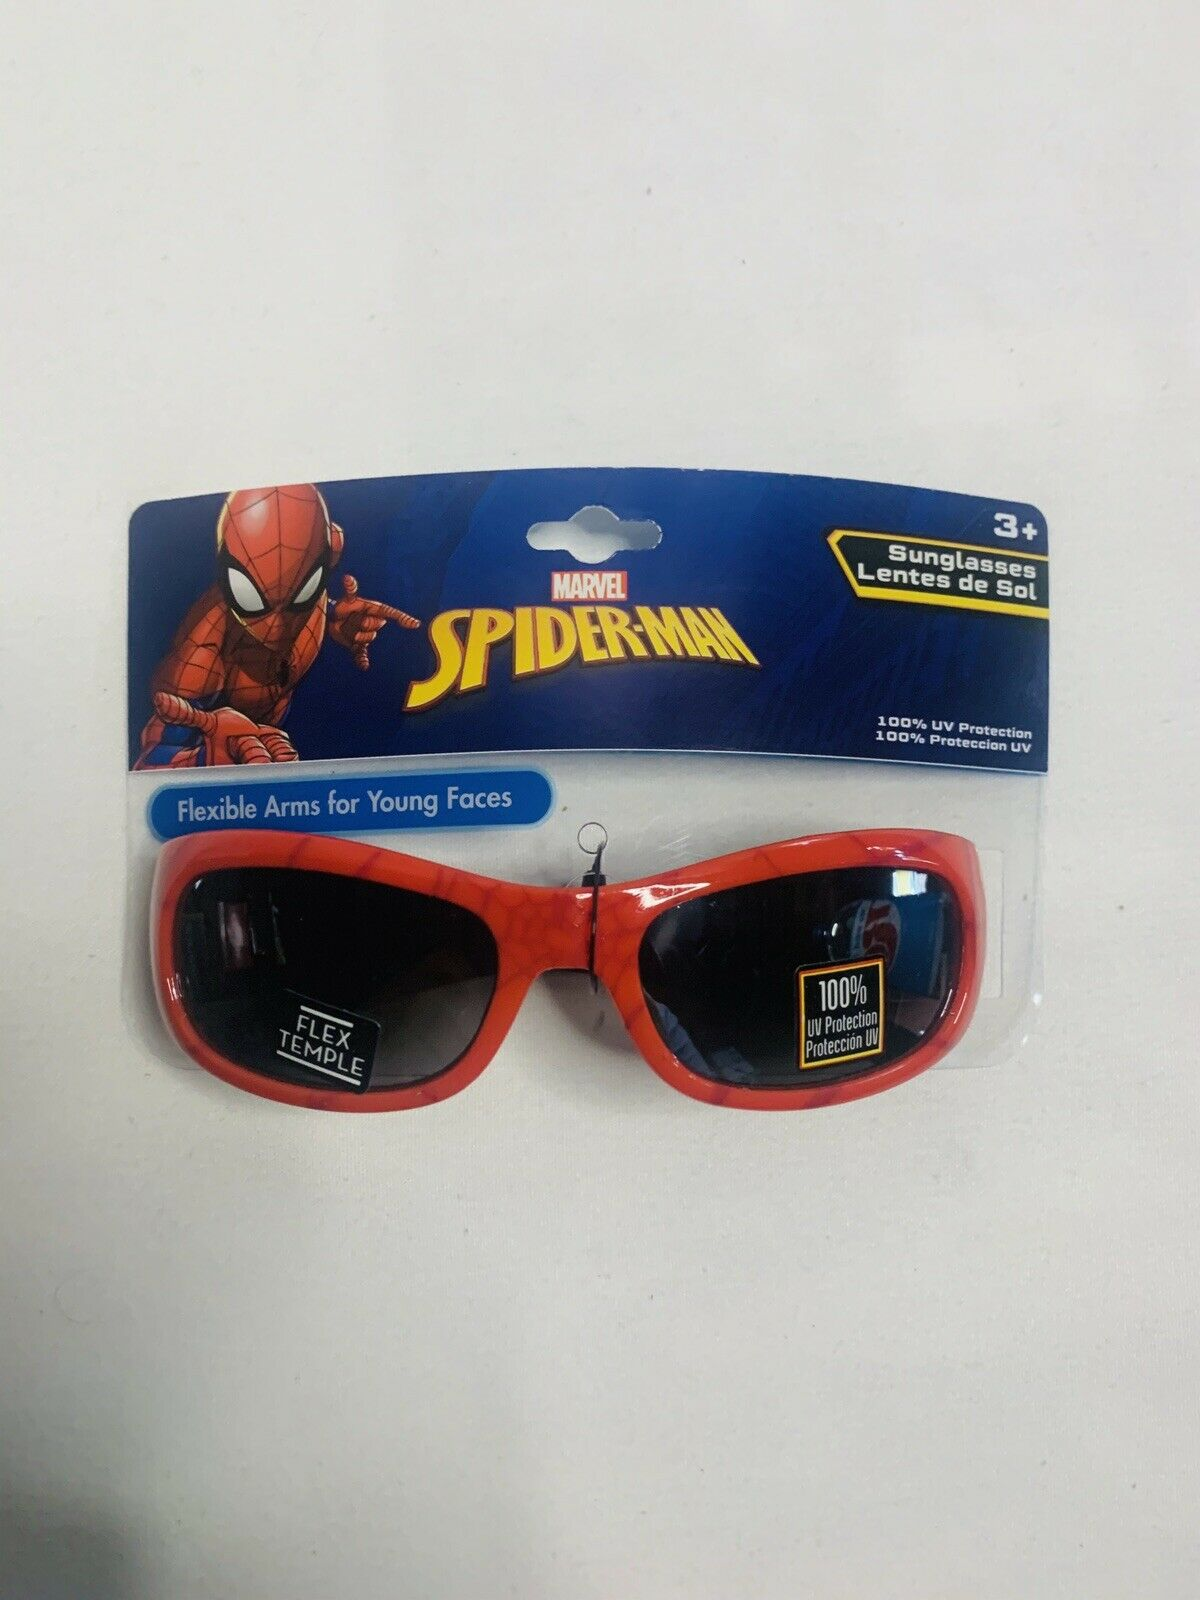 HOVUK/® Boys Sunglasses PawPatrol,Avengers,Spiderman Kids Sunshades 3+years